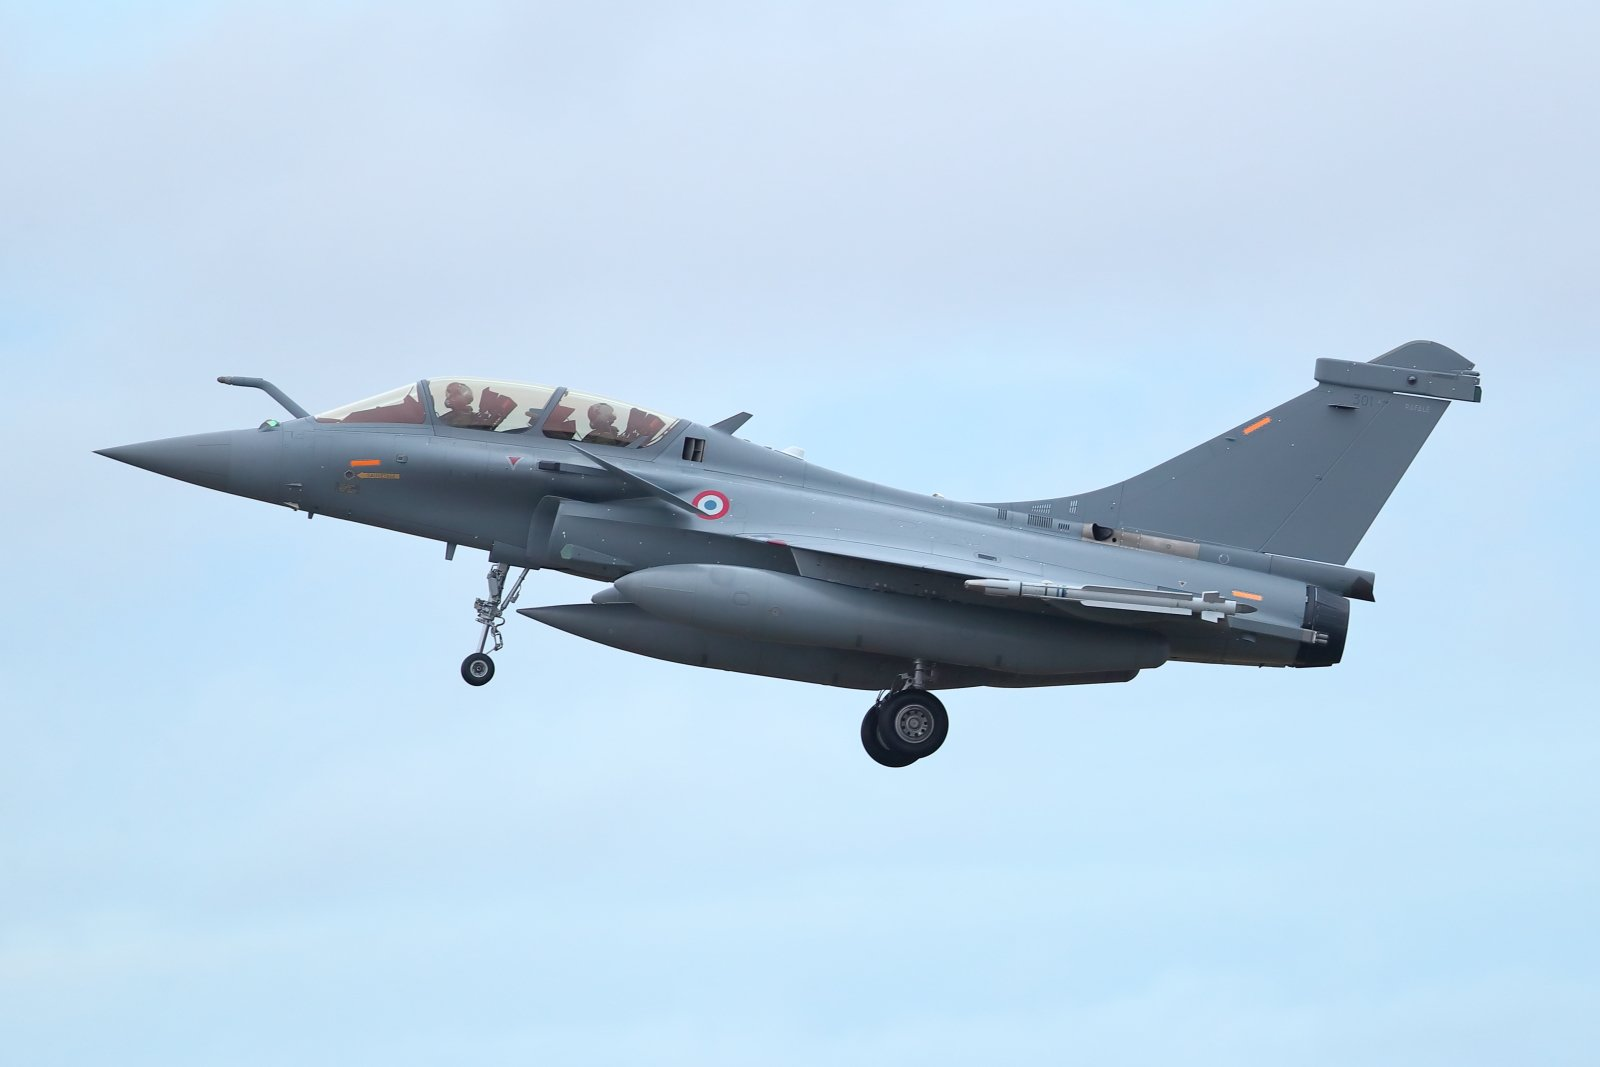 Dassault Rafale B 301 laskussa Pirkkalaan 2020 01 20